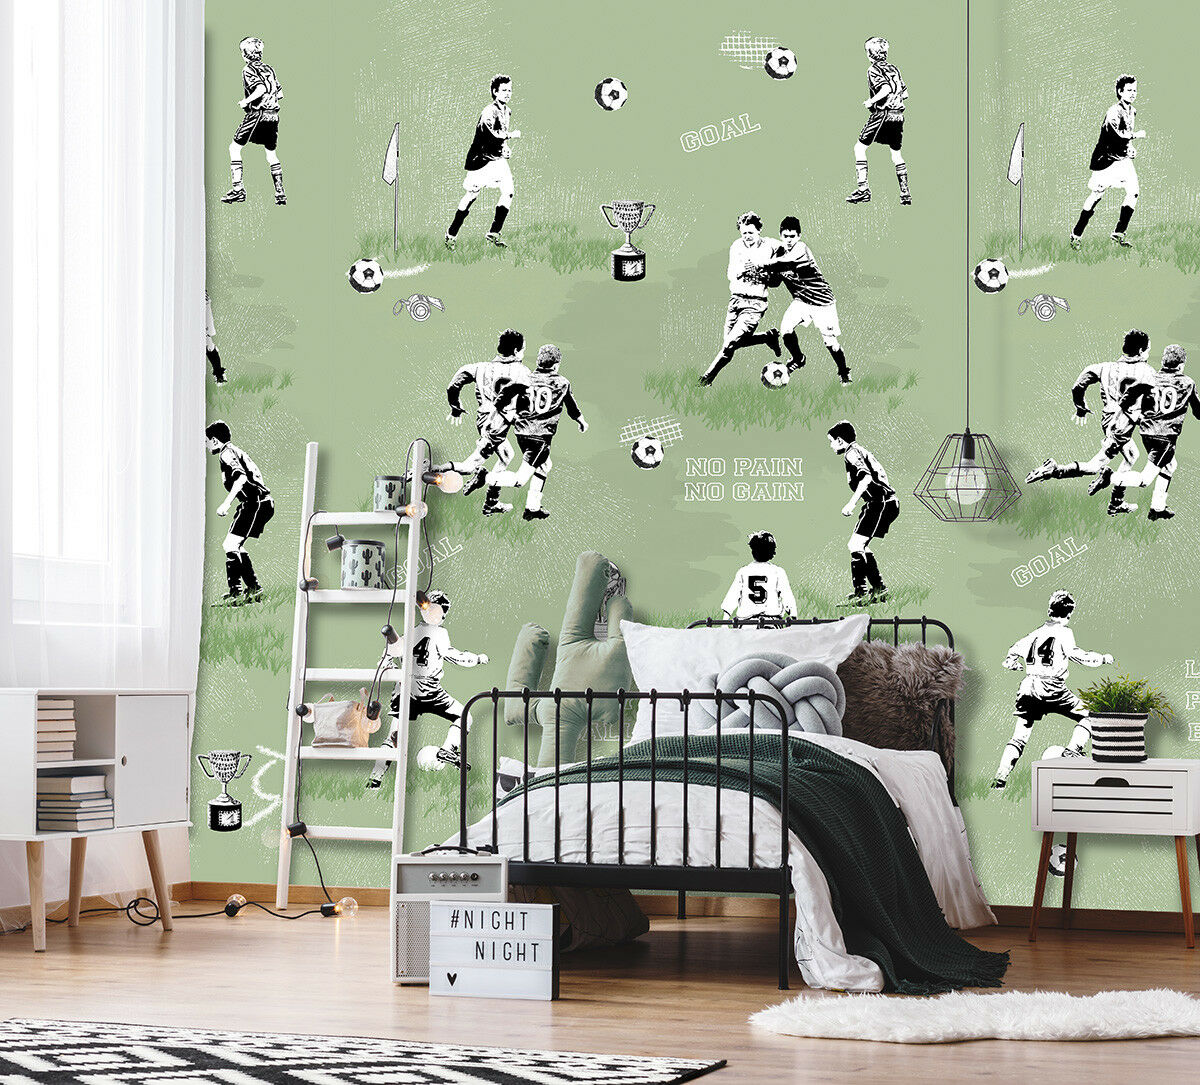 Vlies Fototapete Fußball Goal Pokal Tapete grün Wandbild 200 x 300cm INK7096